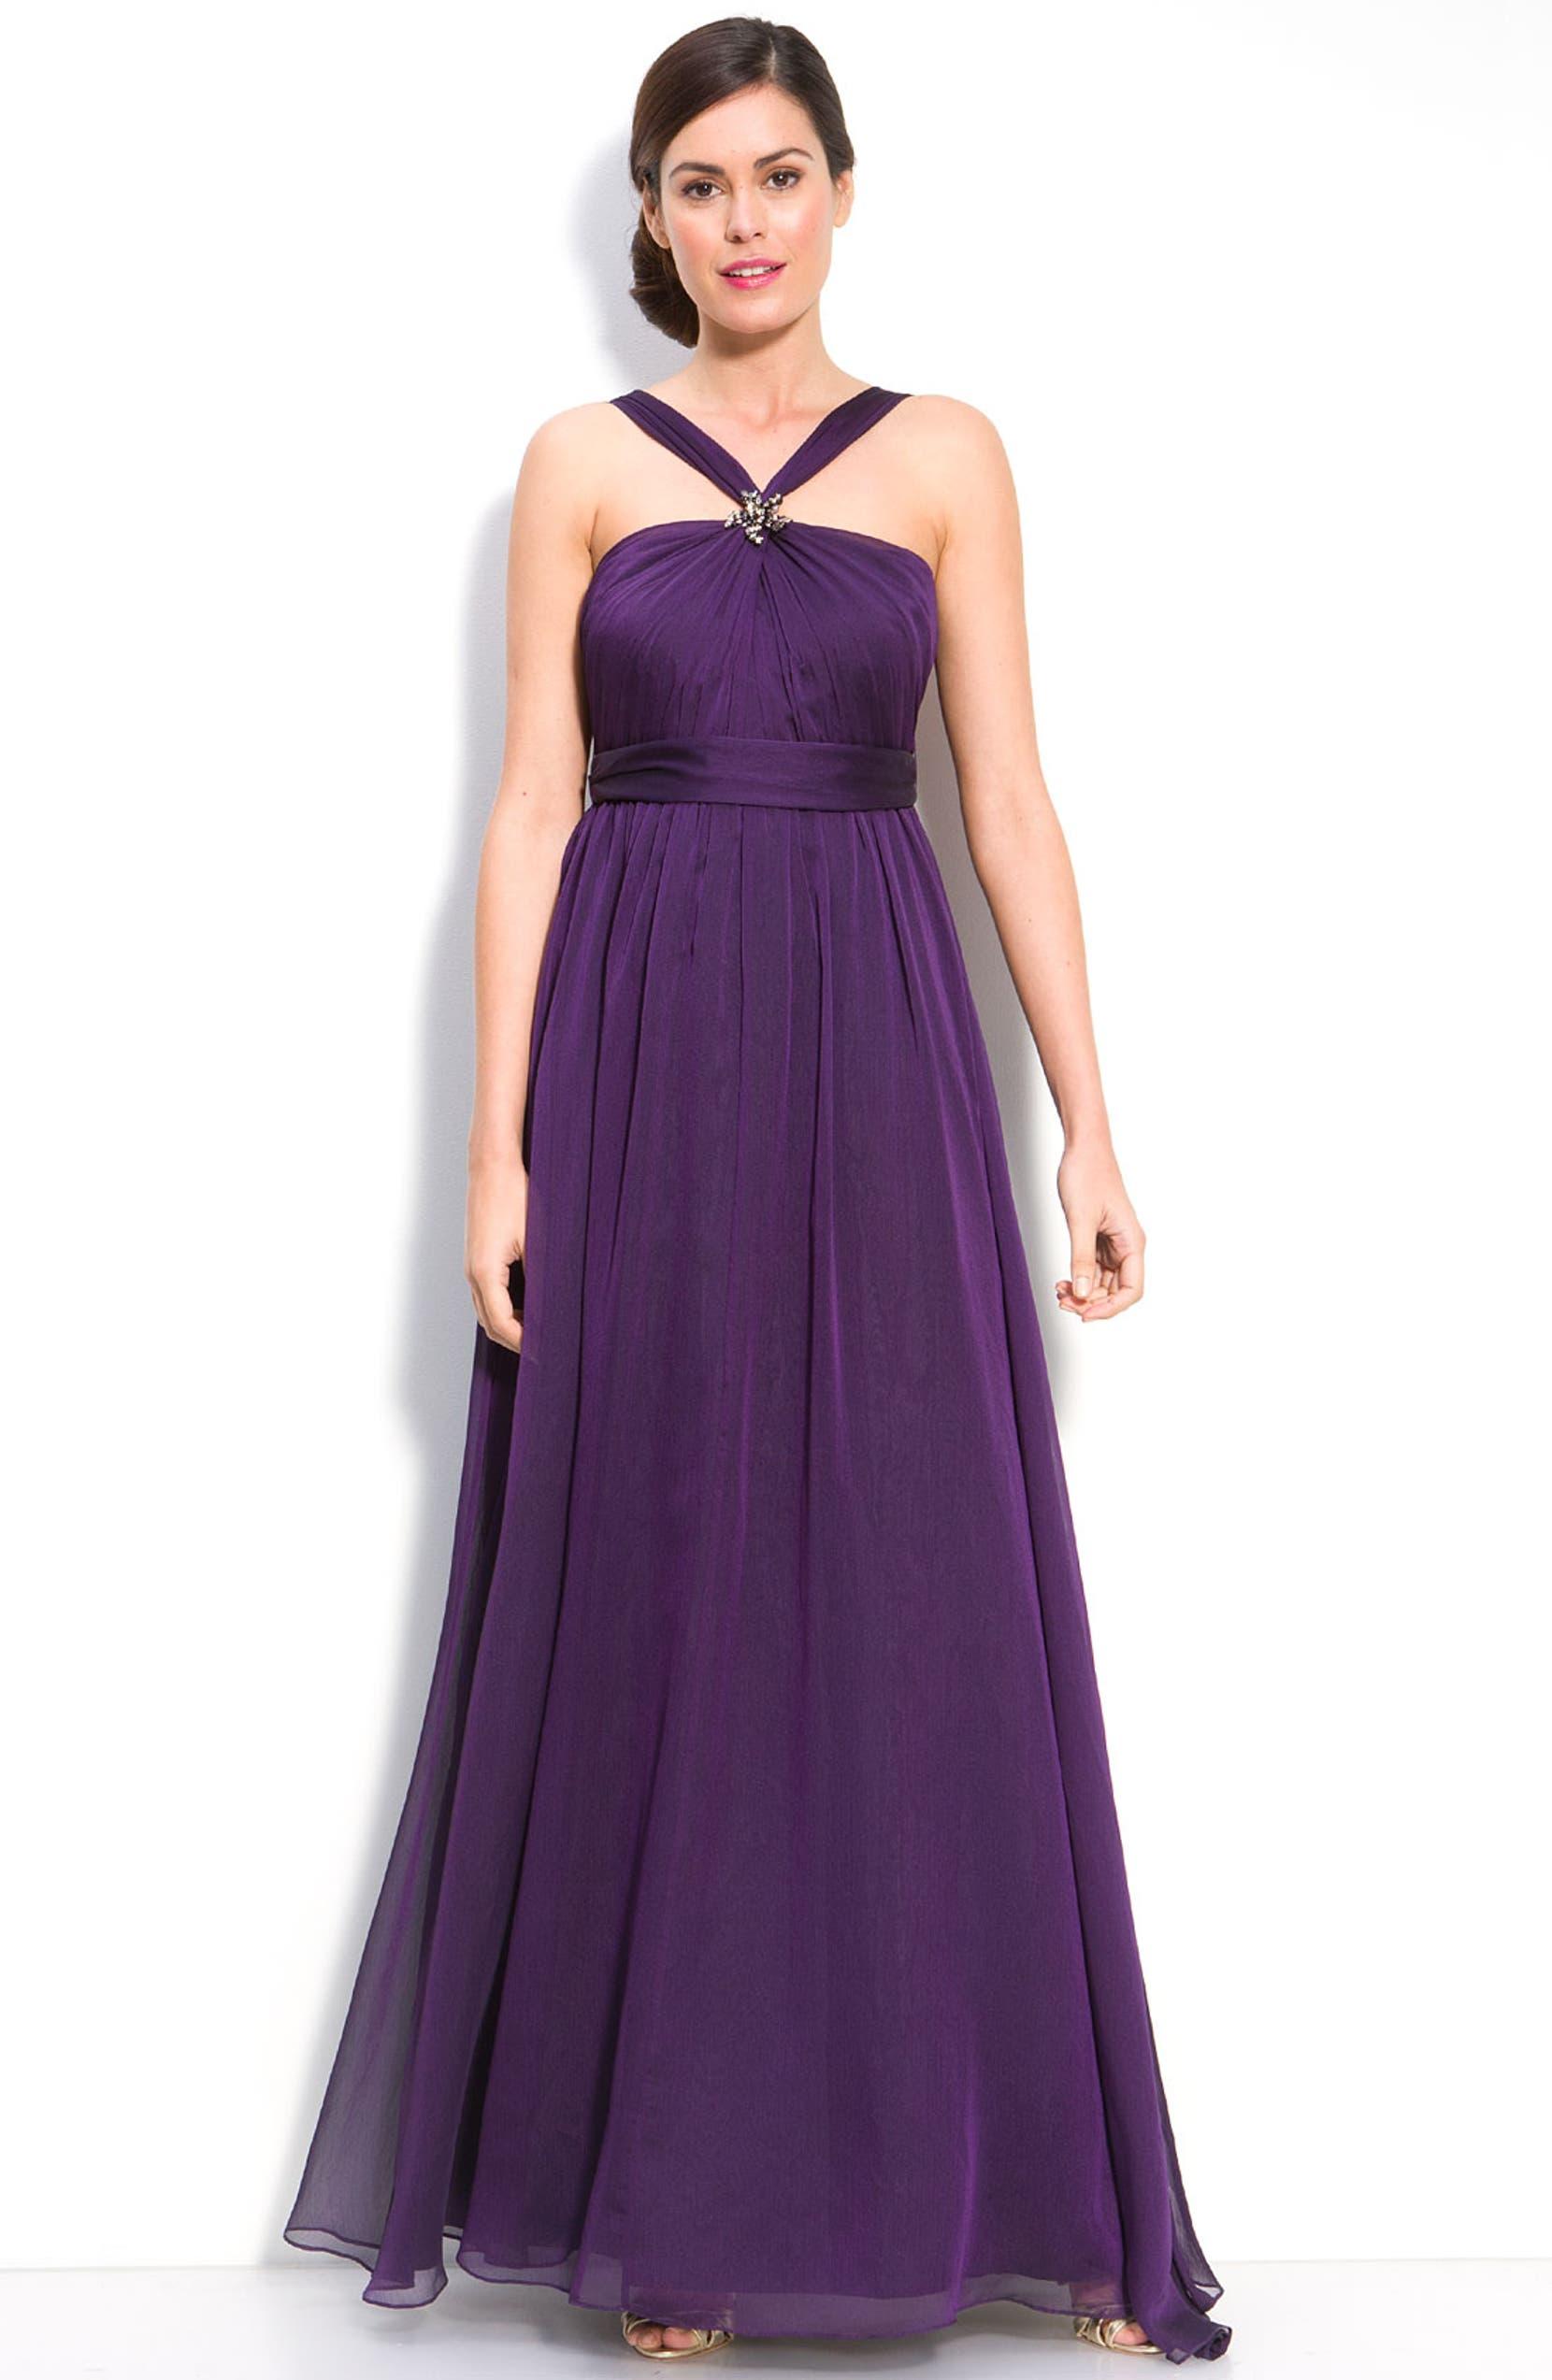 129dafad85416 ML Monique Lhuillier Bridesmaids Cationic Chiffon Halter Gown (Nordstrom  Exclusive) | Nordstrom